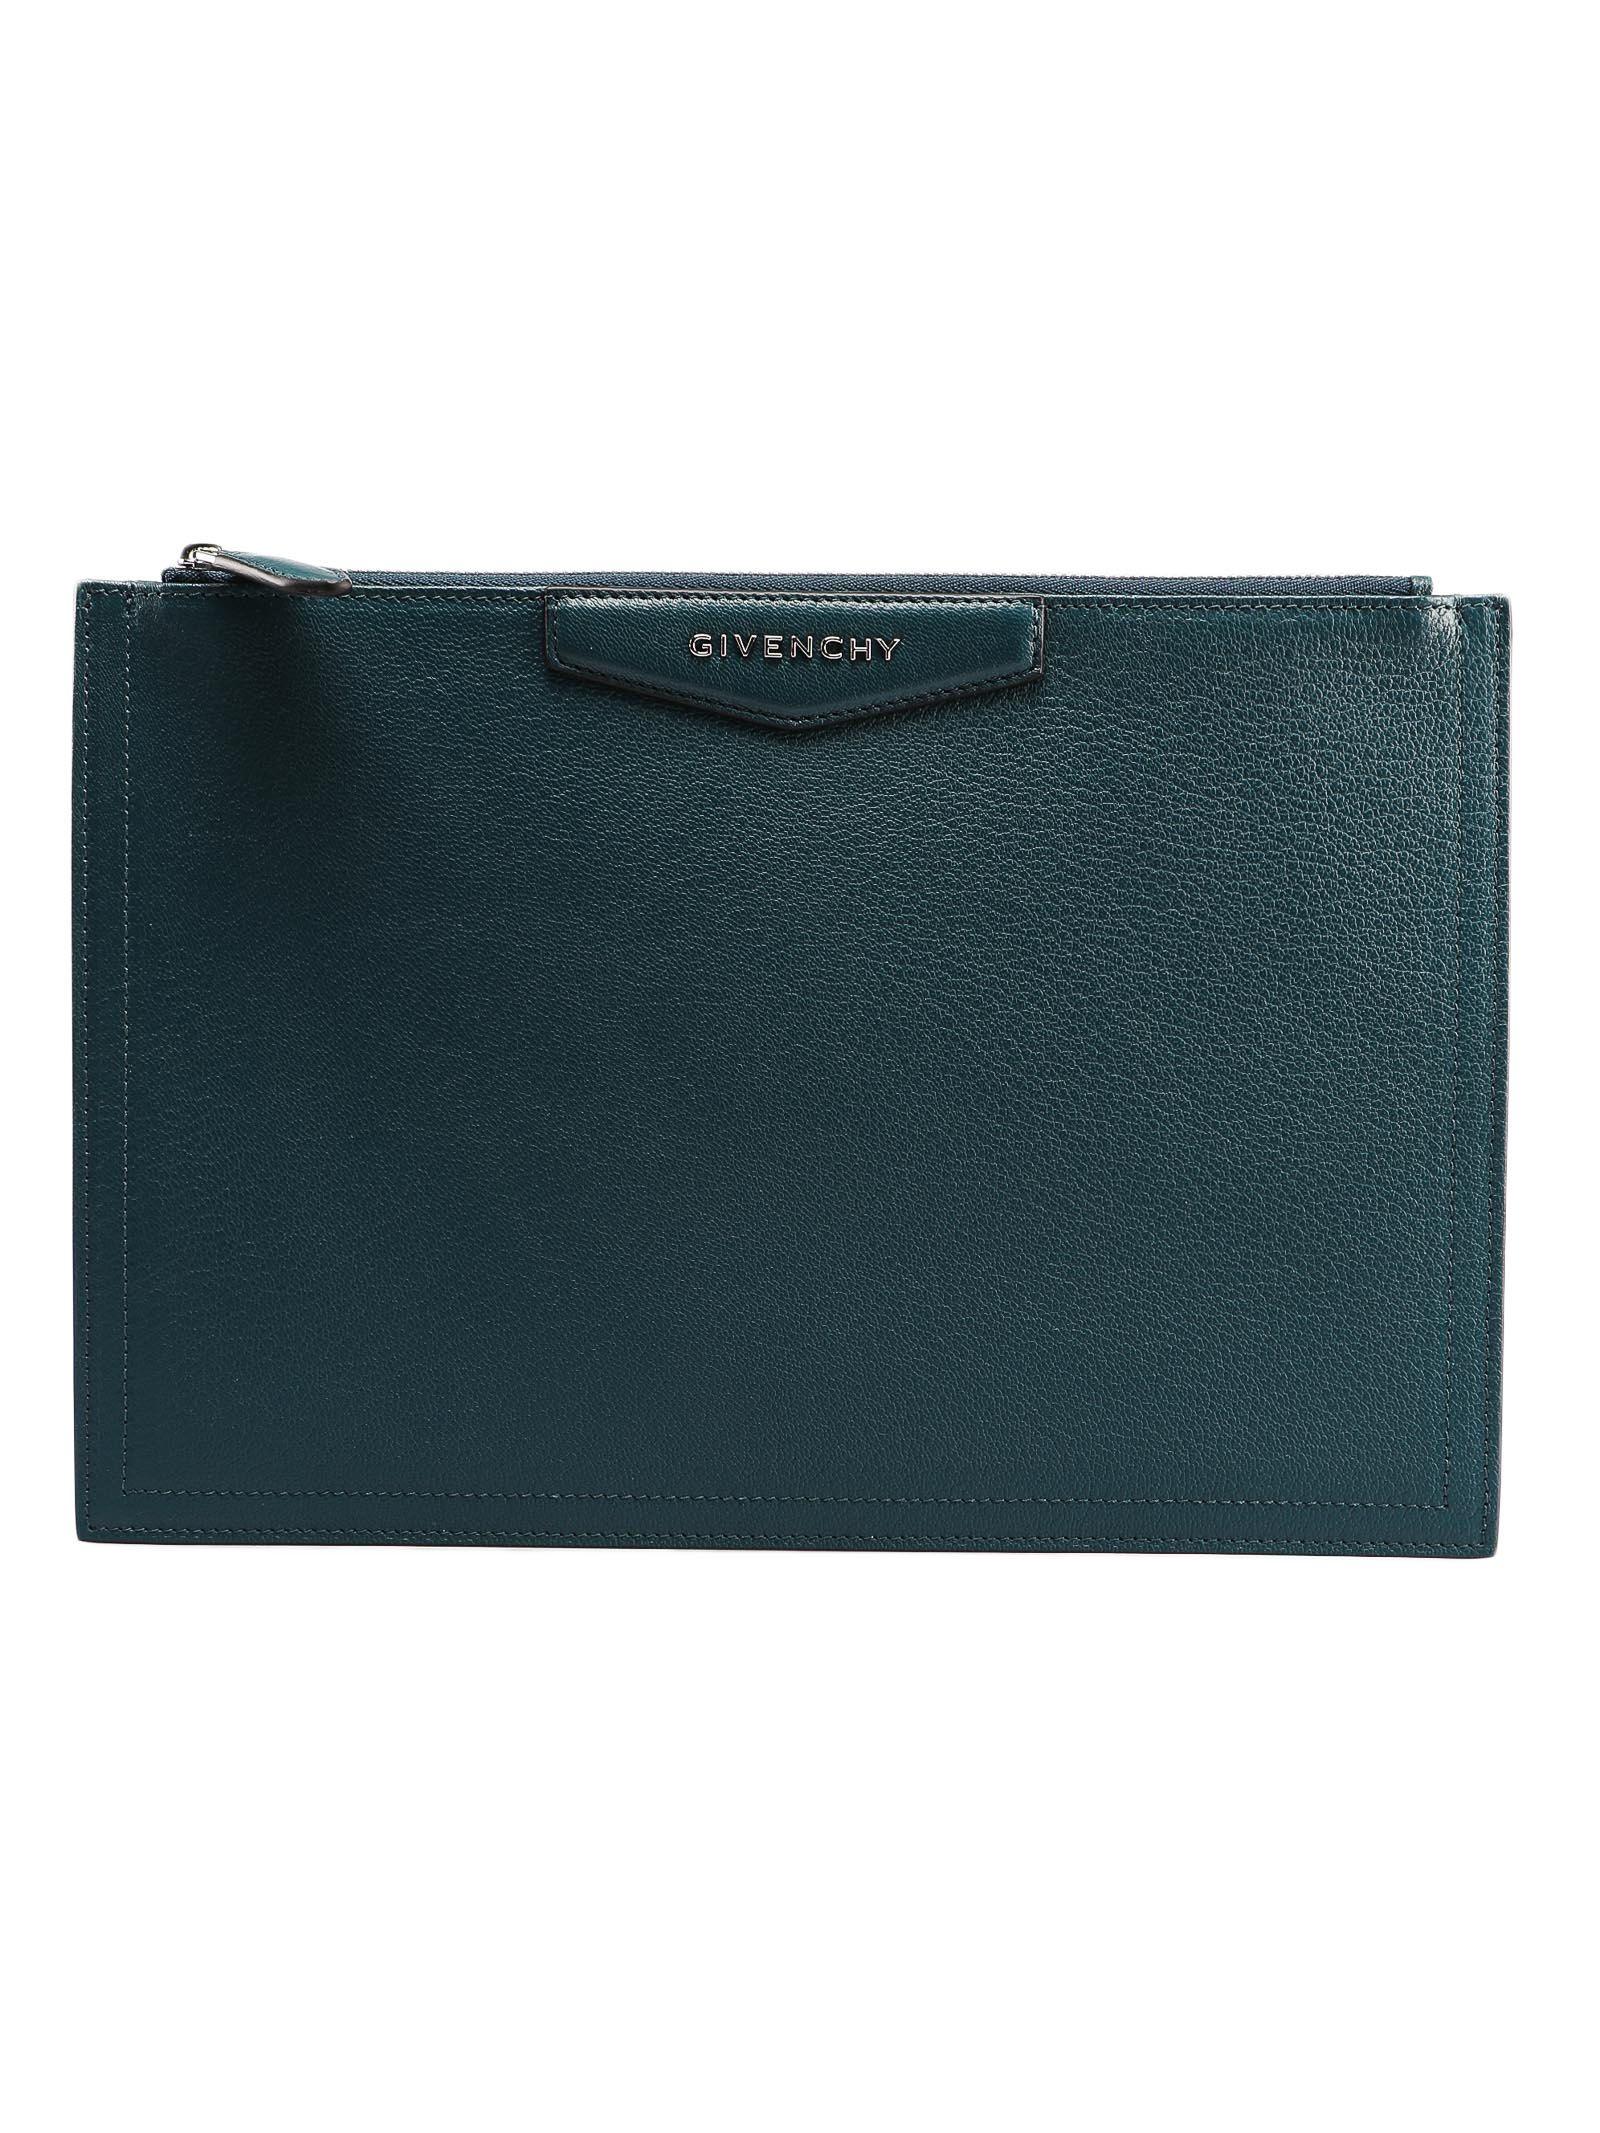 9f5645a4e9 Givenchy Givenchy Large Antigona Pouch - Prussian Blu - 10954672 ...